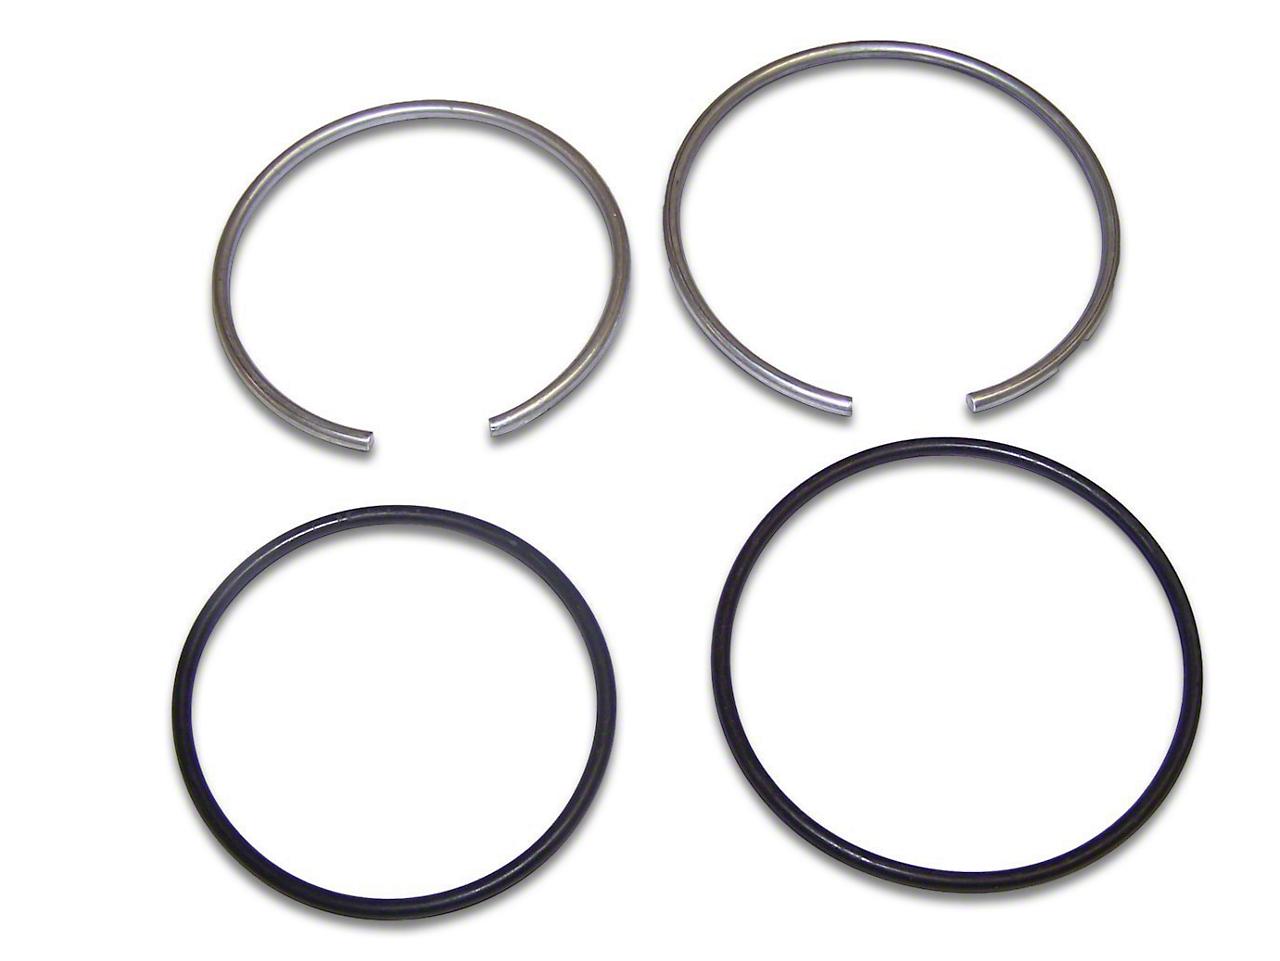 Crown Automotive Steering Gear End Plug Seal Kit (87-02 Wrangler YJ & TJ w/ Power Steering)